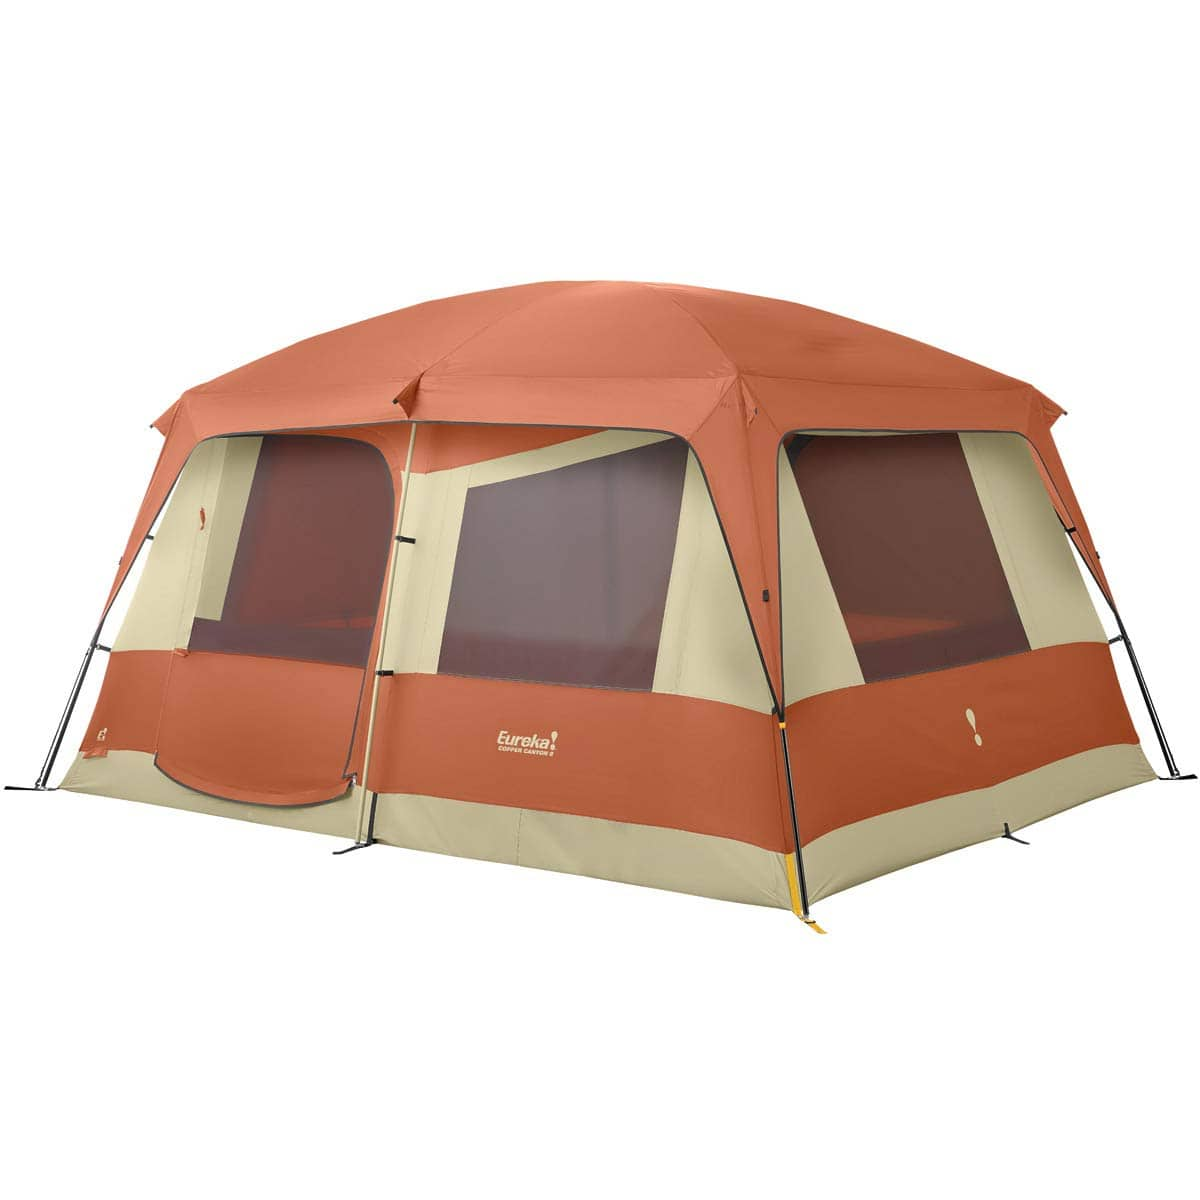 Eureka Copper Canyon 8 -Person Tent [8 Person] $195